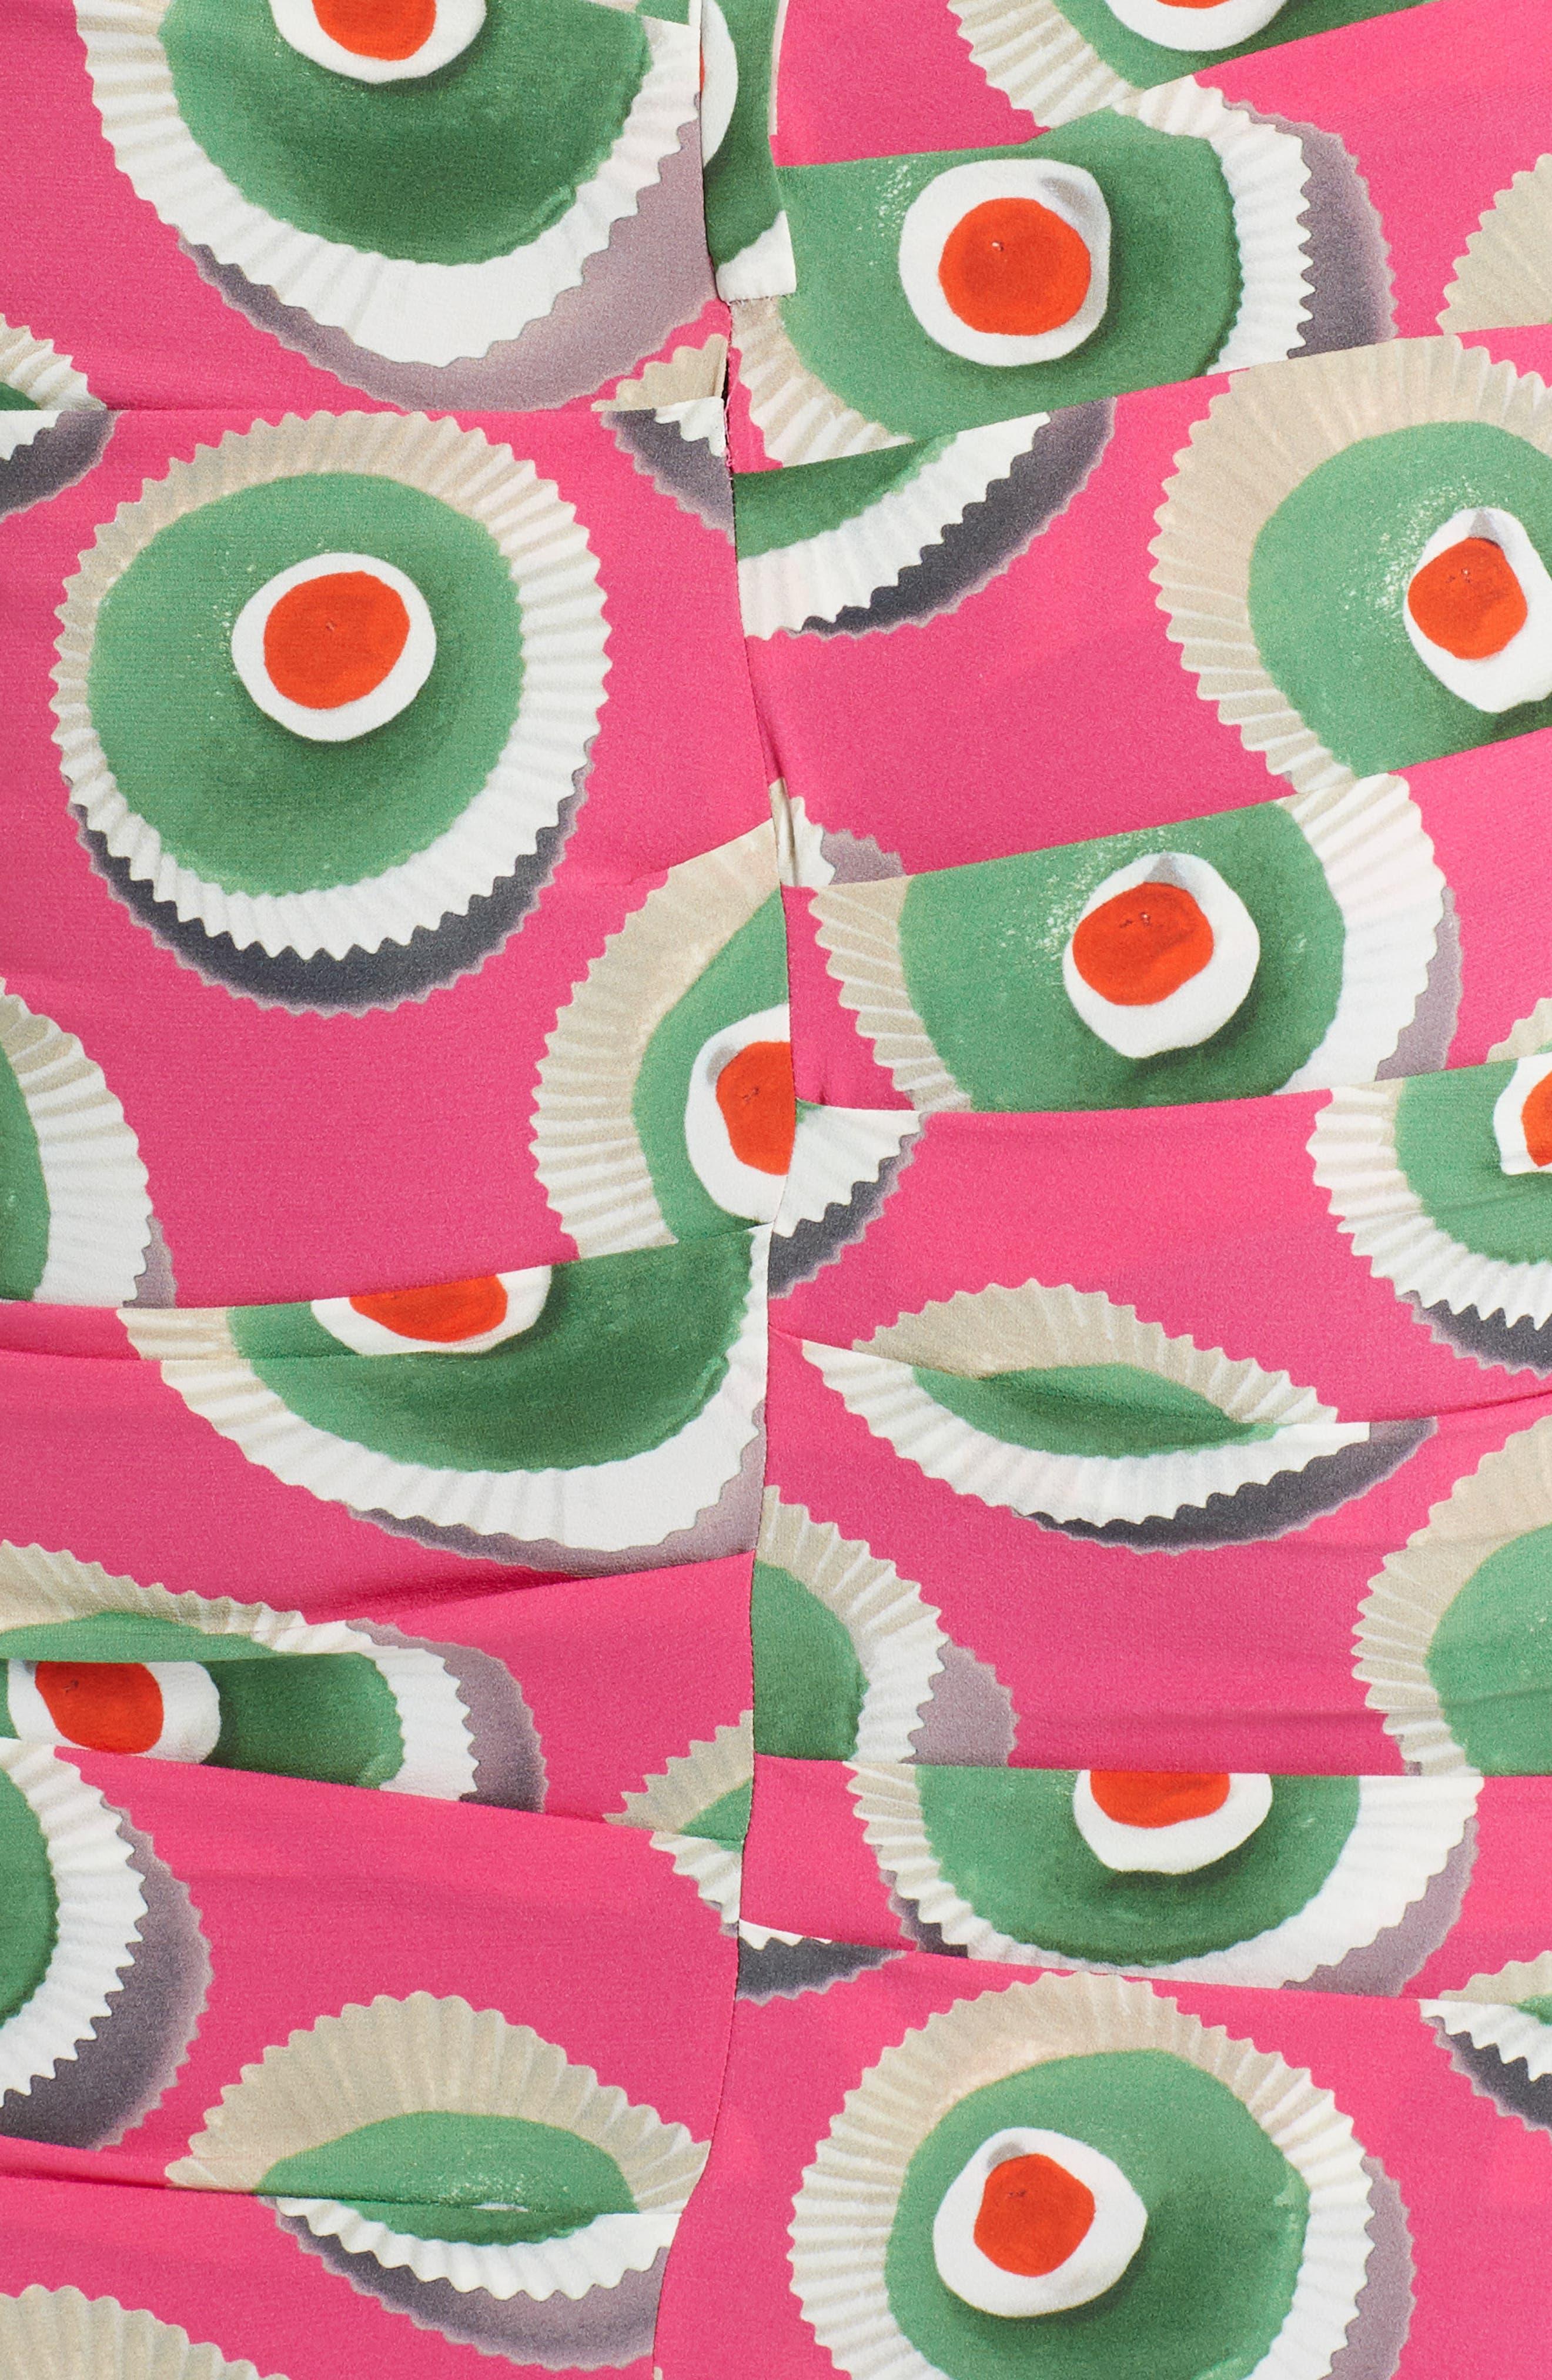 Cassate Print Silk Blend Dress,                             Alternate thumbnail 5, color,                             651